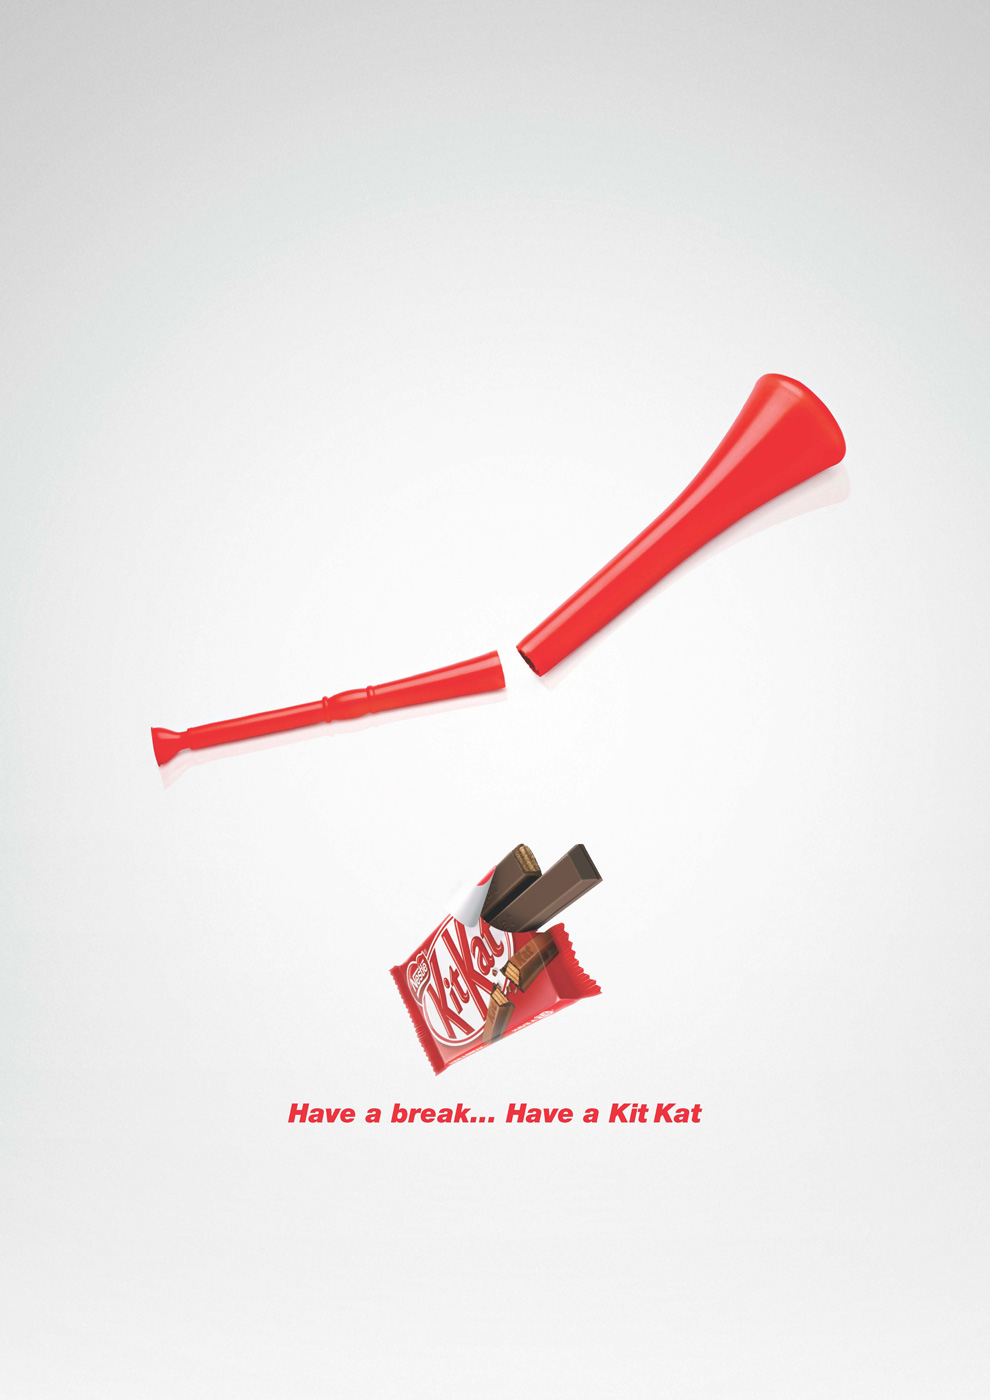 http://3.bp.blogspot.com/_42nL05s3A-8/TDIUZG2mQeI/AAAAAAAACzg/2qb4HIEHqD0/s1600/KitKat_vuvuzela.jpg